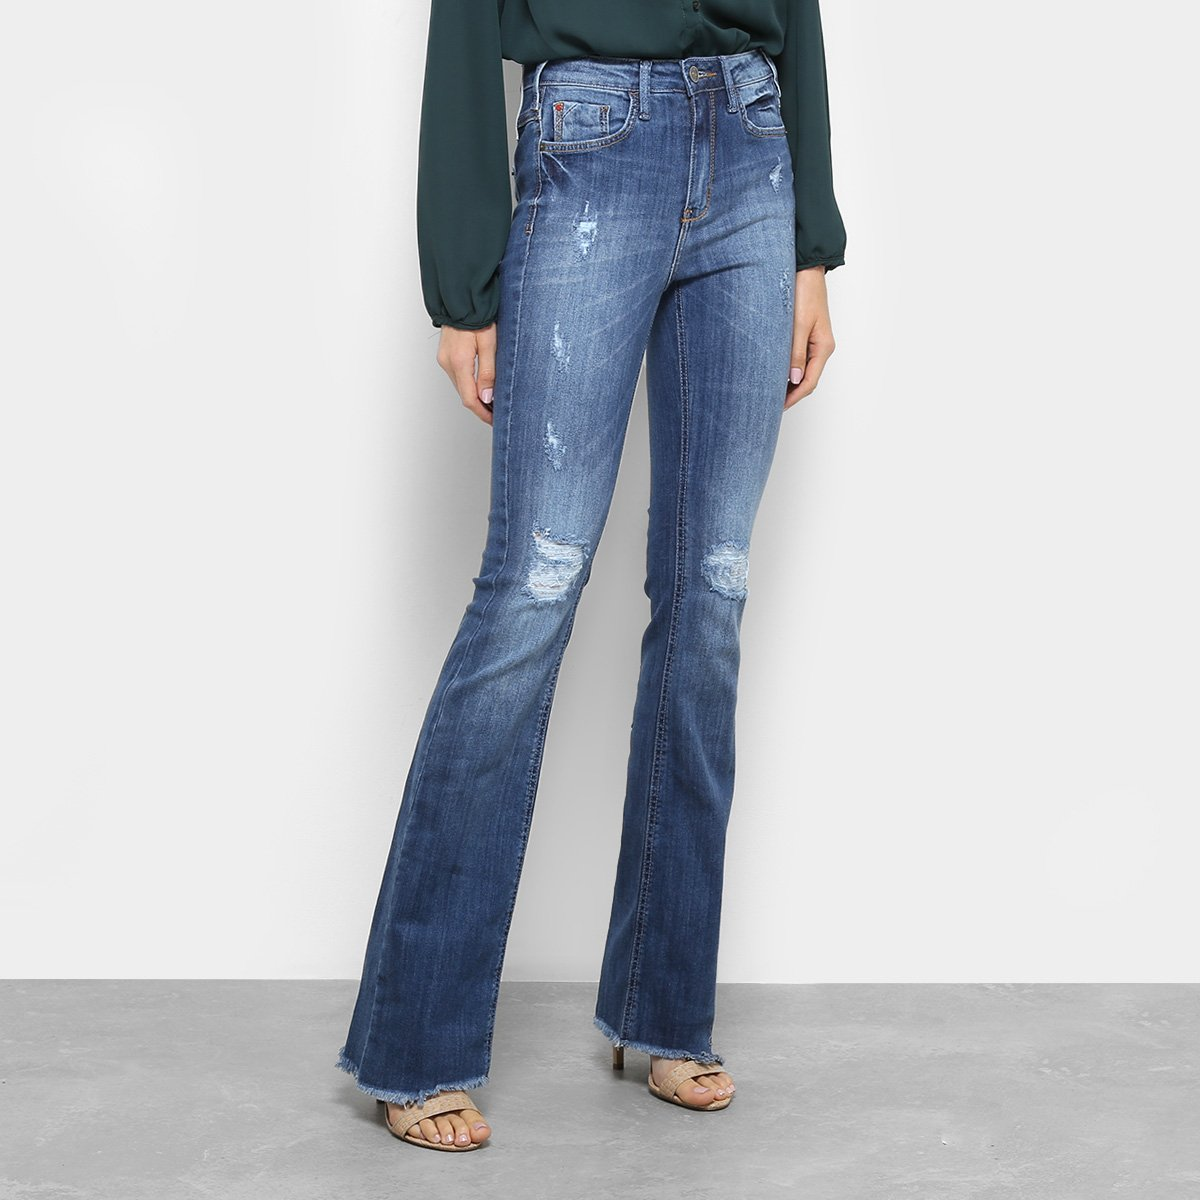 273f45841 Calça Jeans Flare Forum Estonada Cintura Alta Feminina